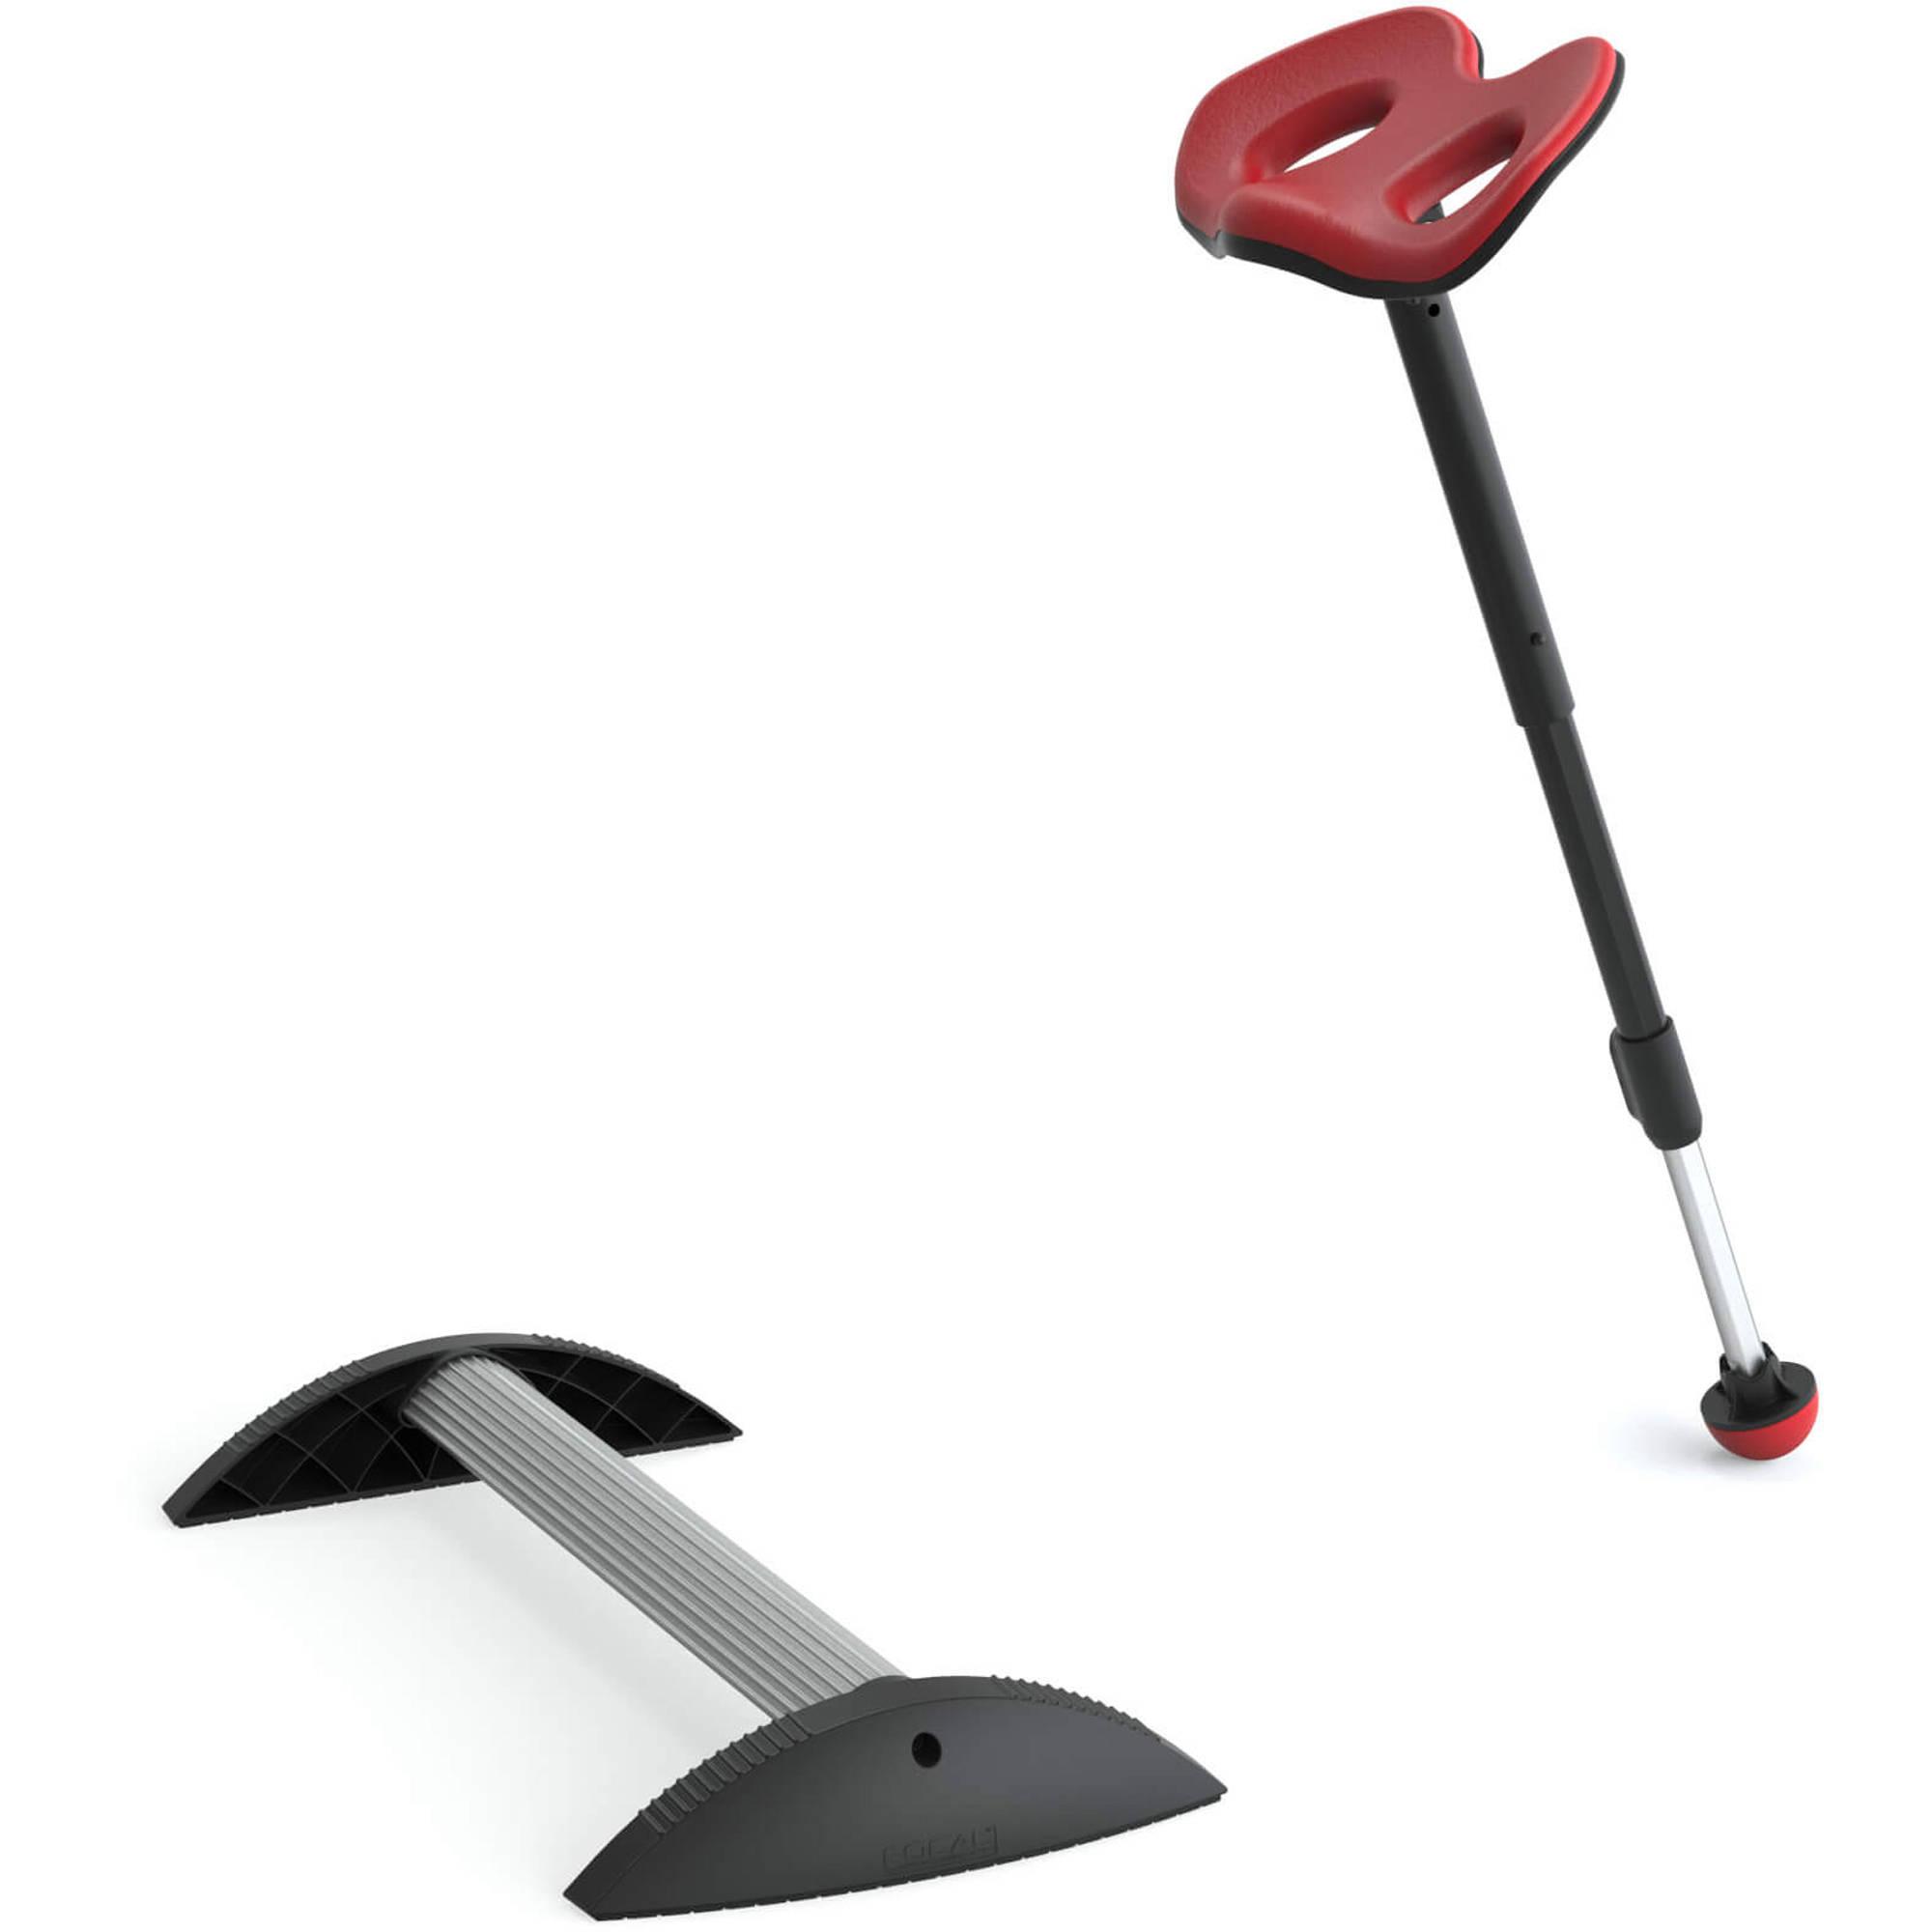 Focal Upright Furniture Mogo Upright Seat U0026 Stabilizing Foot Rest Kit  (Chili Pepper Red Cushion